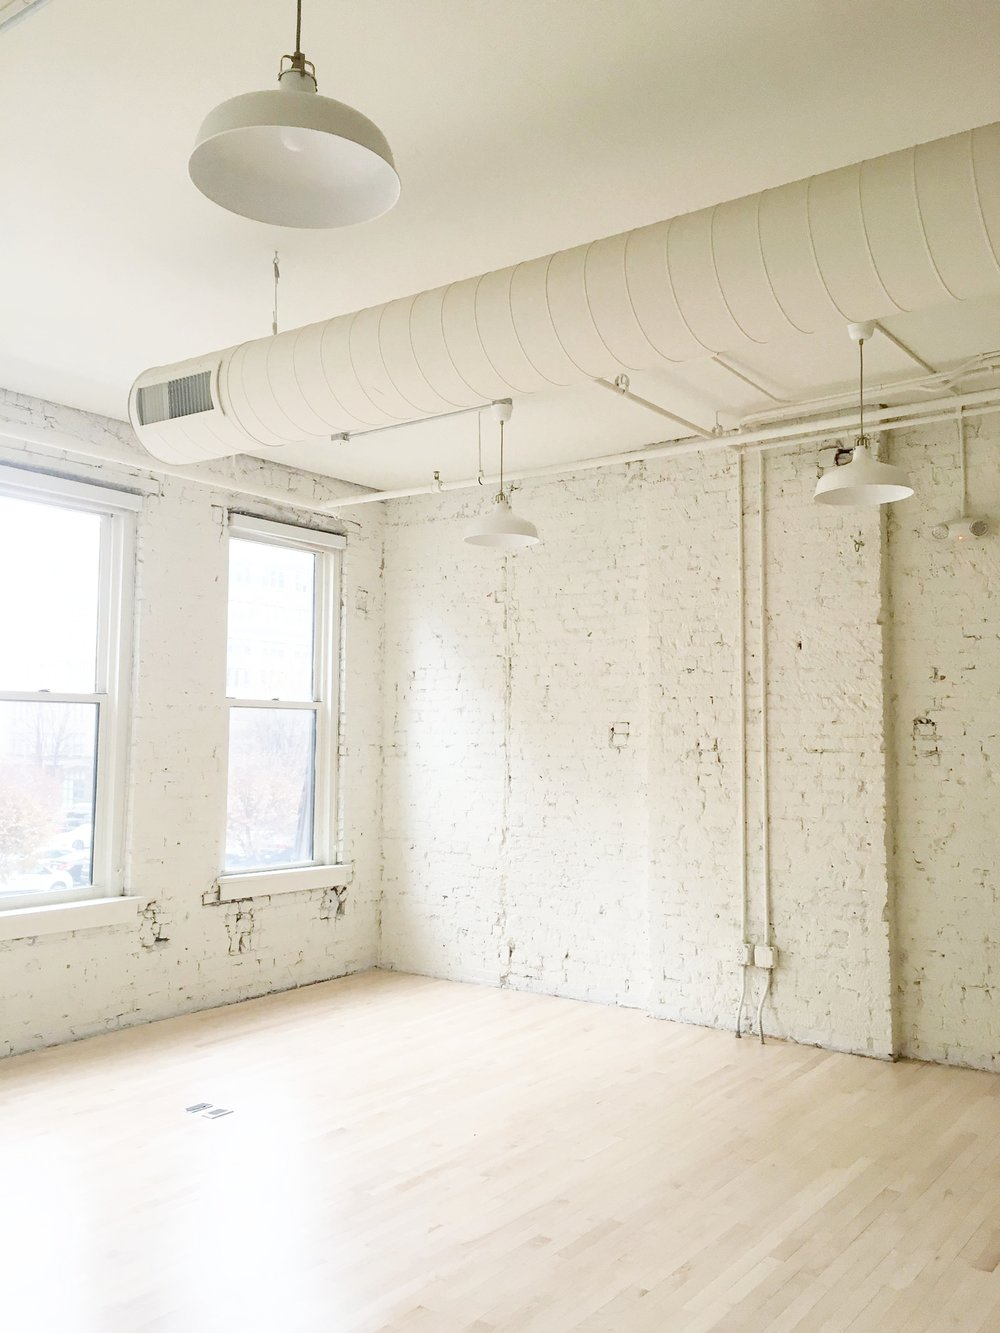 Studio Rental | 6-10 People - $75 Per Hour